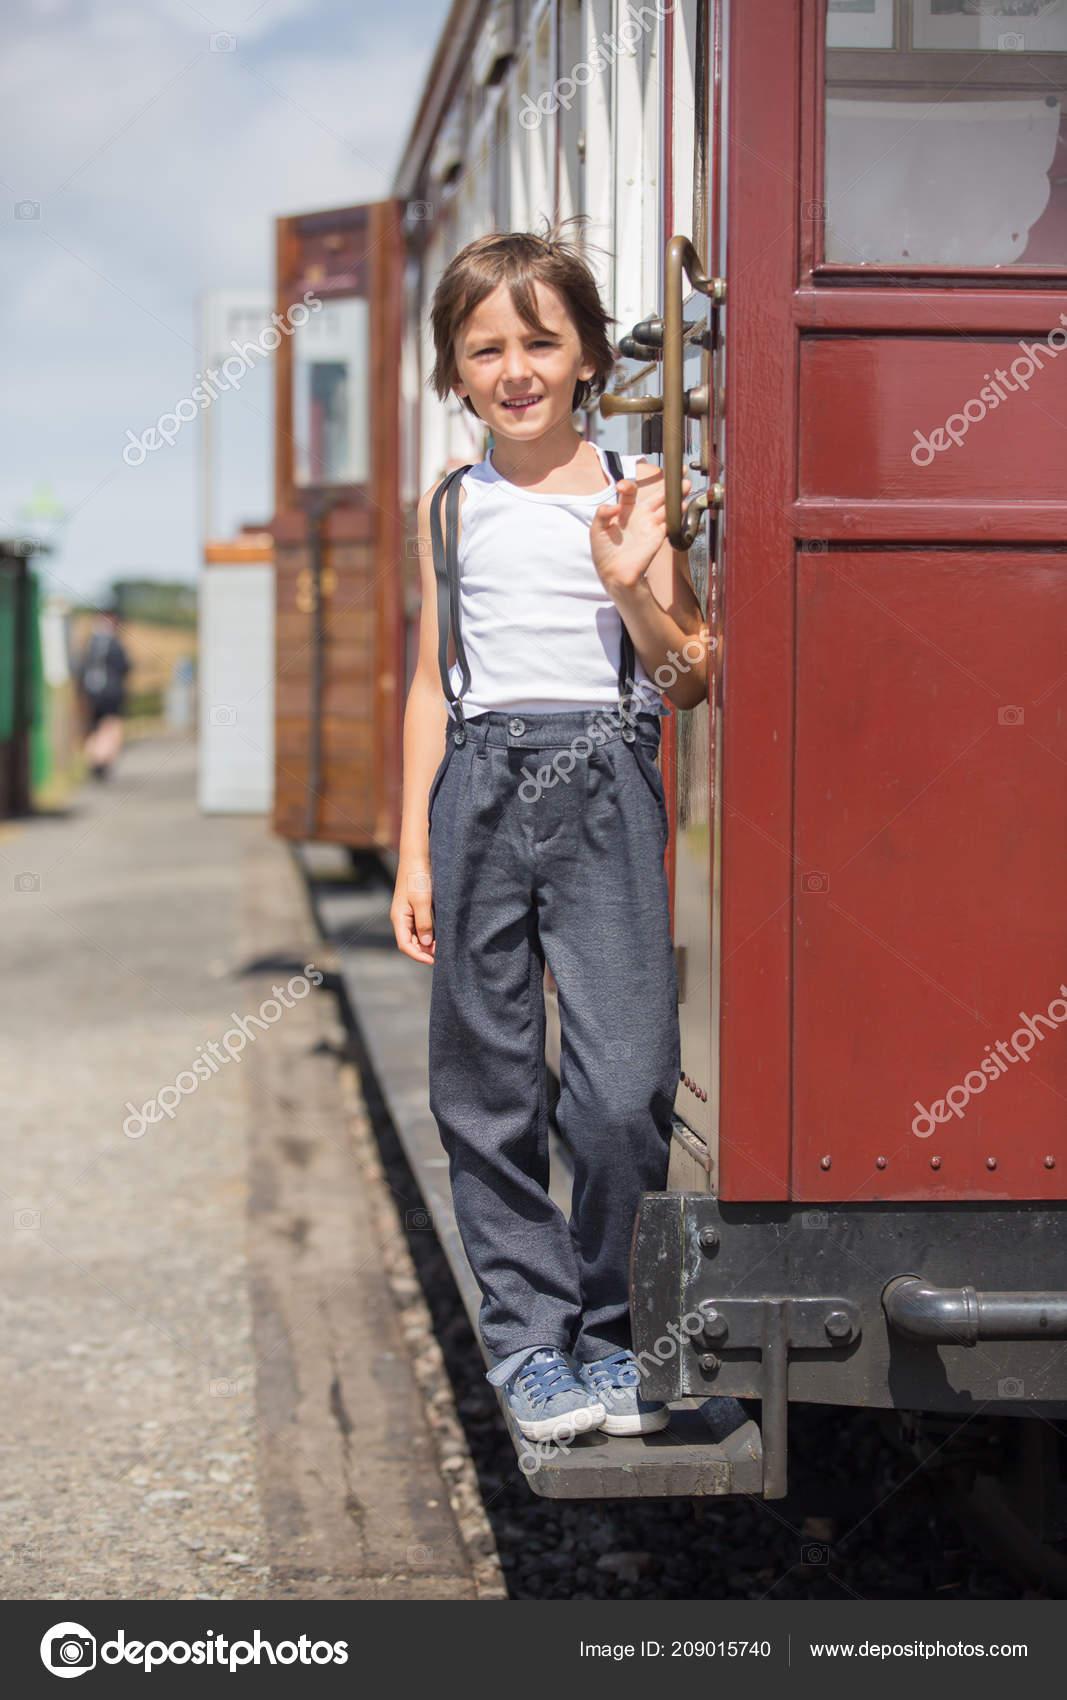 1be4fa93d2b0 Όμορφο παιδί, ντυμένοι με ρούχα vintage, απολαμβάνοντας το παλιό ατμοκίνητο  τρένο μια καυτή θερινή ημέρα στην Αγγλία — Εικόνα από ...